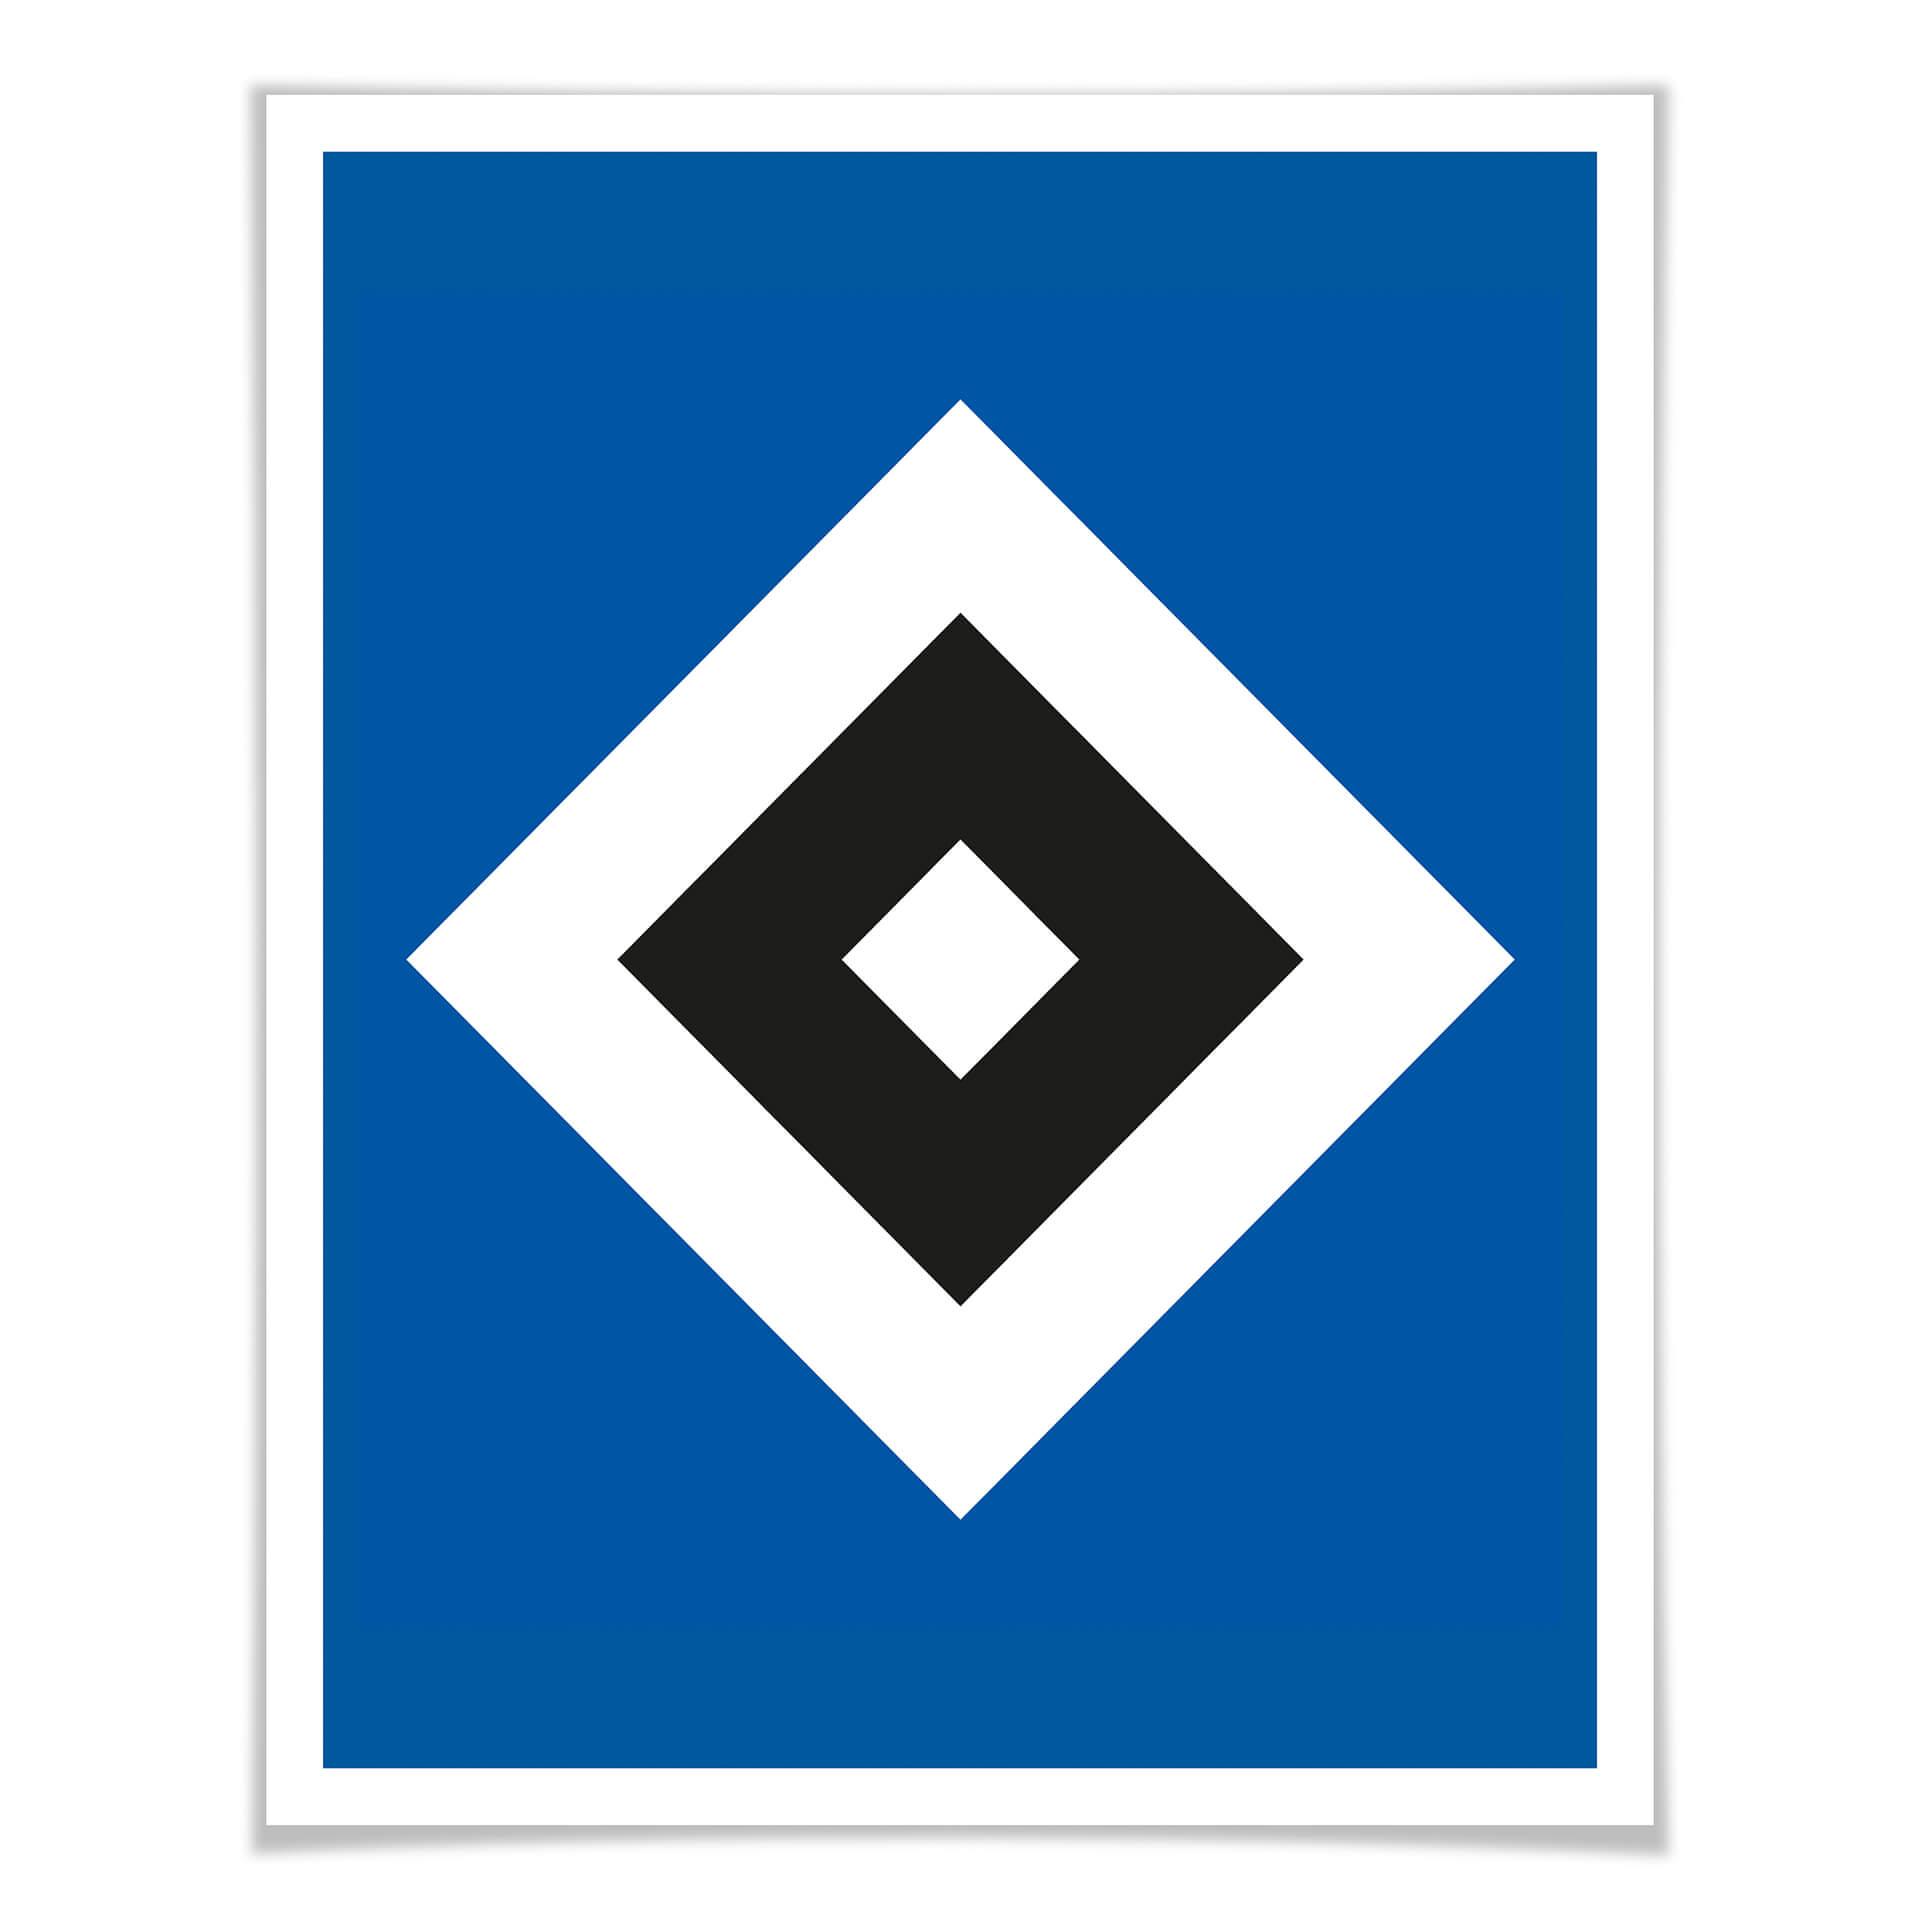 04 Adig Versicherung HSV Hamburger Sport Verein Trikot Pin Badge Away 03